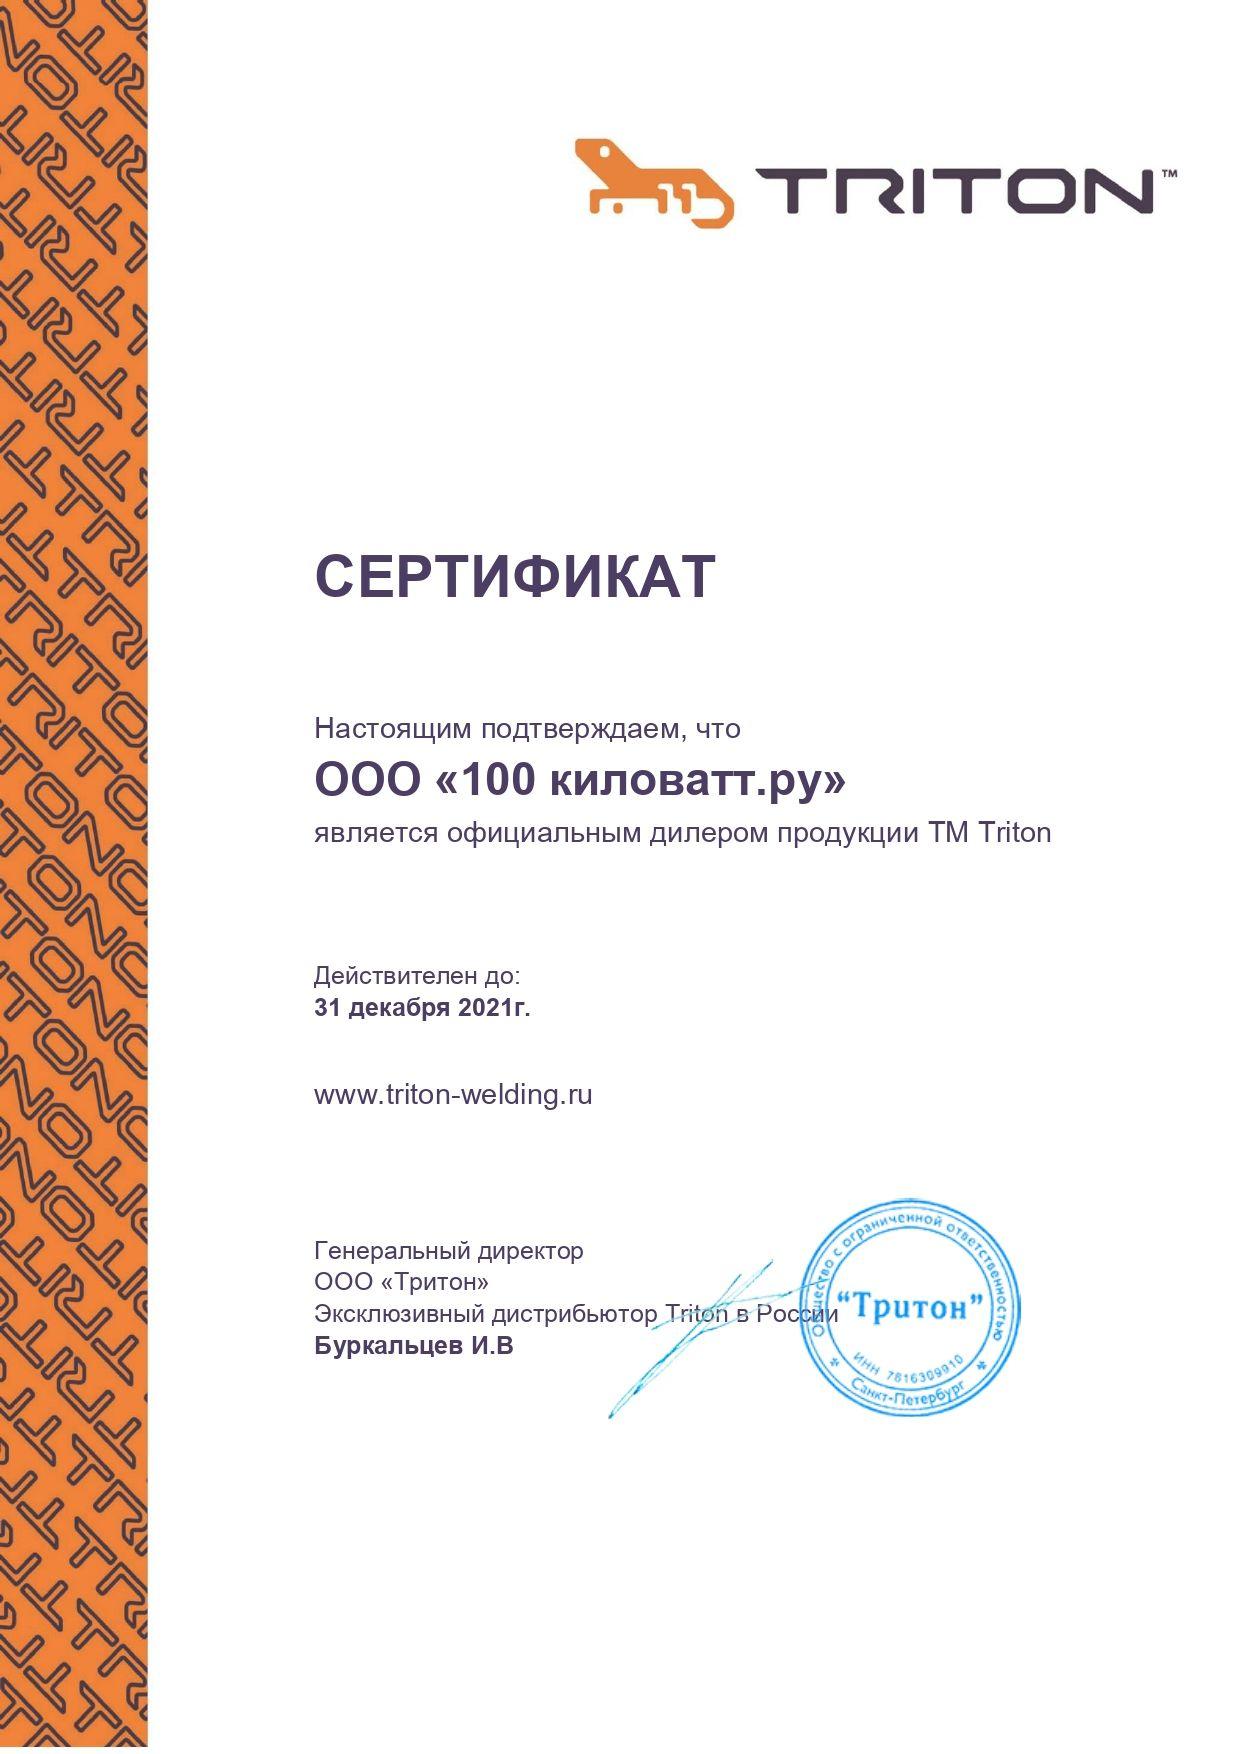 TRITON - Сертификат дилера